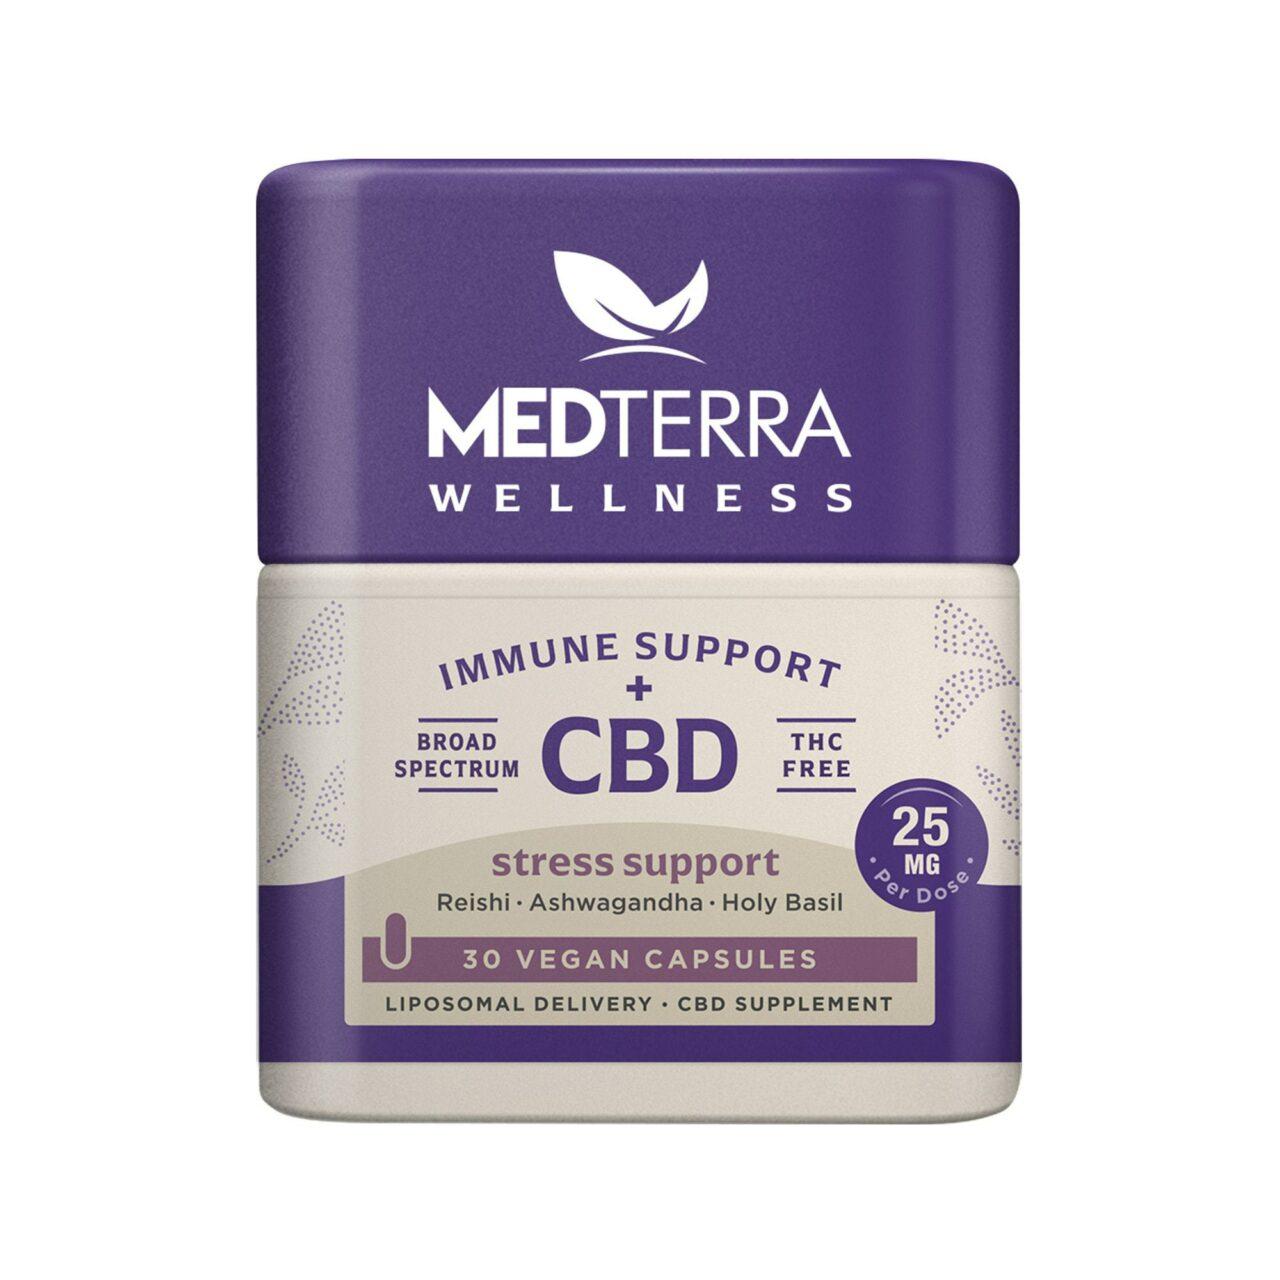 Medterra, Wellness CBD Capsules, Stress Support, Broad Spectrum THC-Free, 30ct, 750mg CBD 1